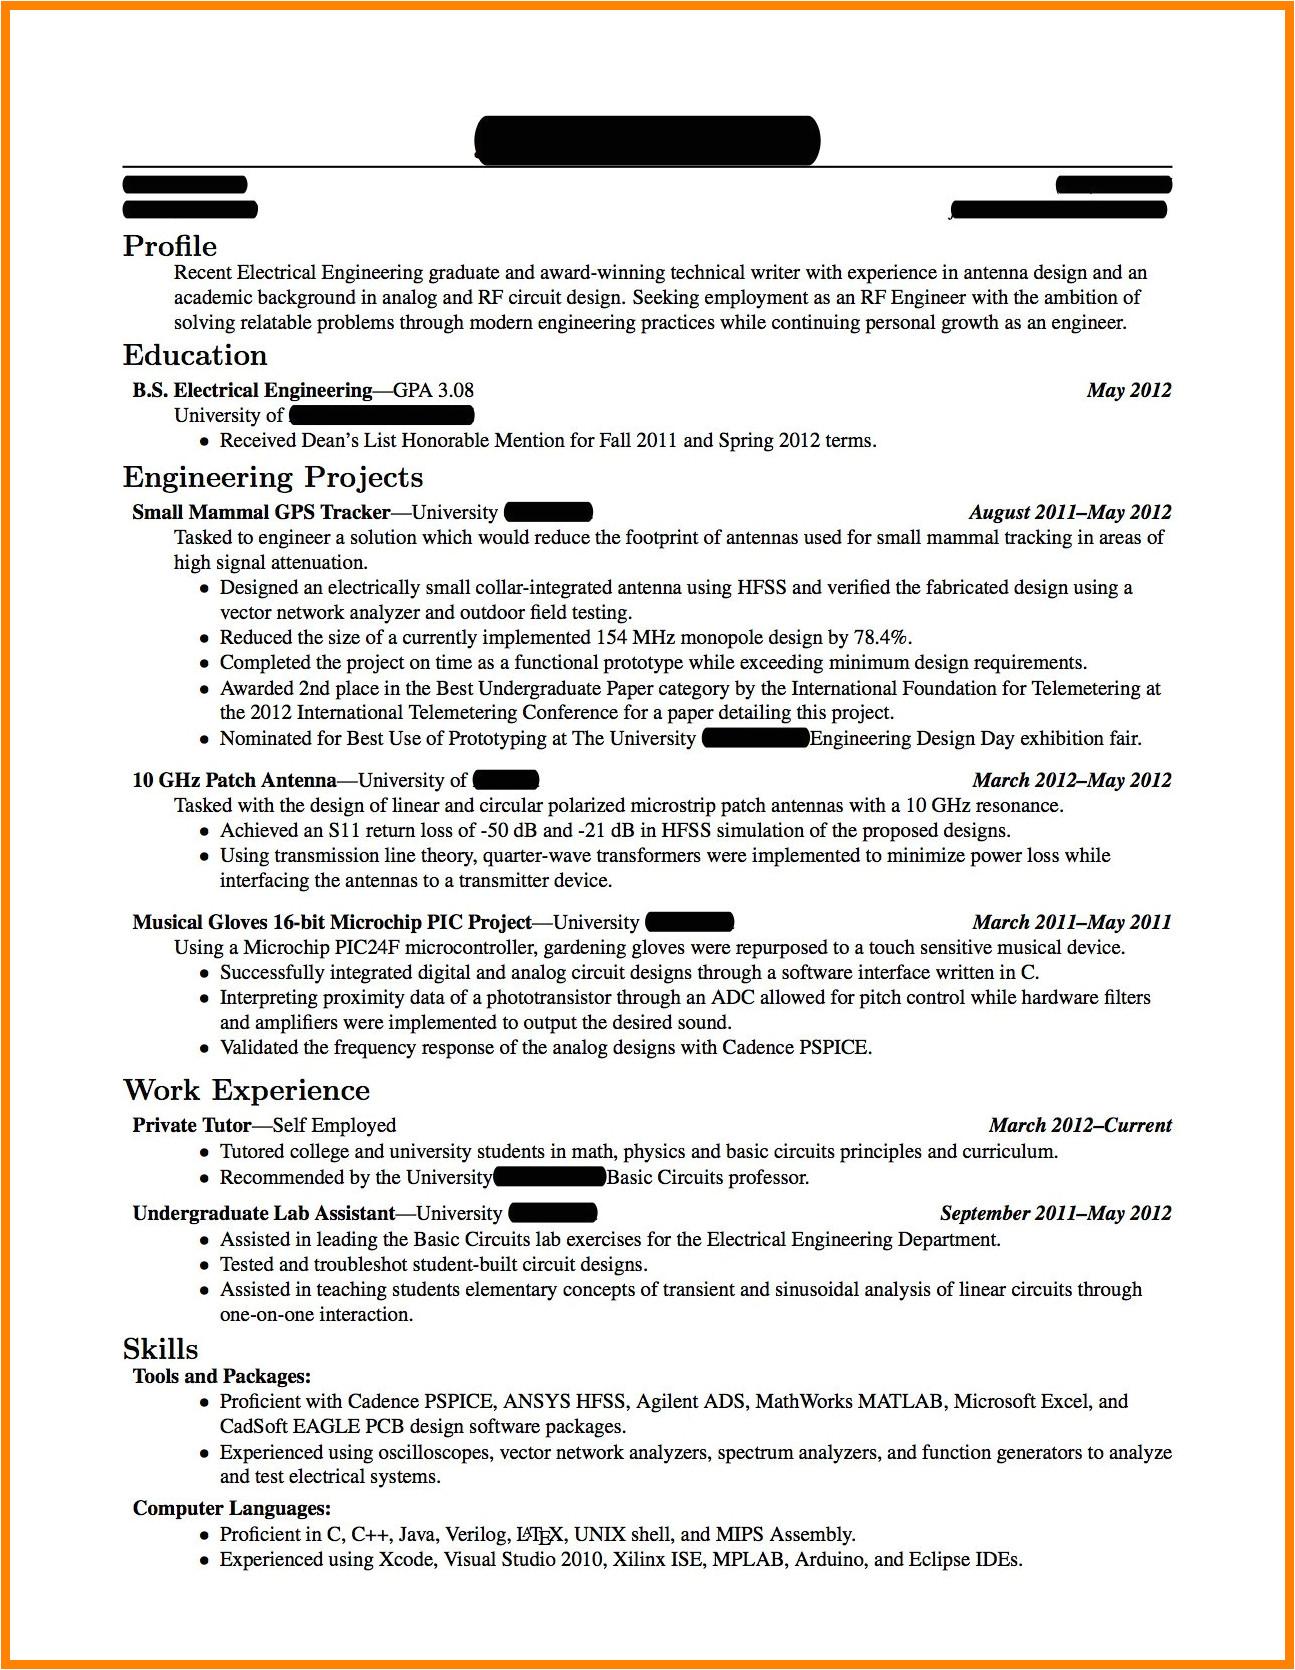 Electrical Engineer Resume New Graduate Sample Resume Electrical Engineer Fresh Graduate 2 Fresh